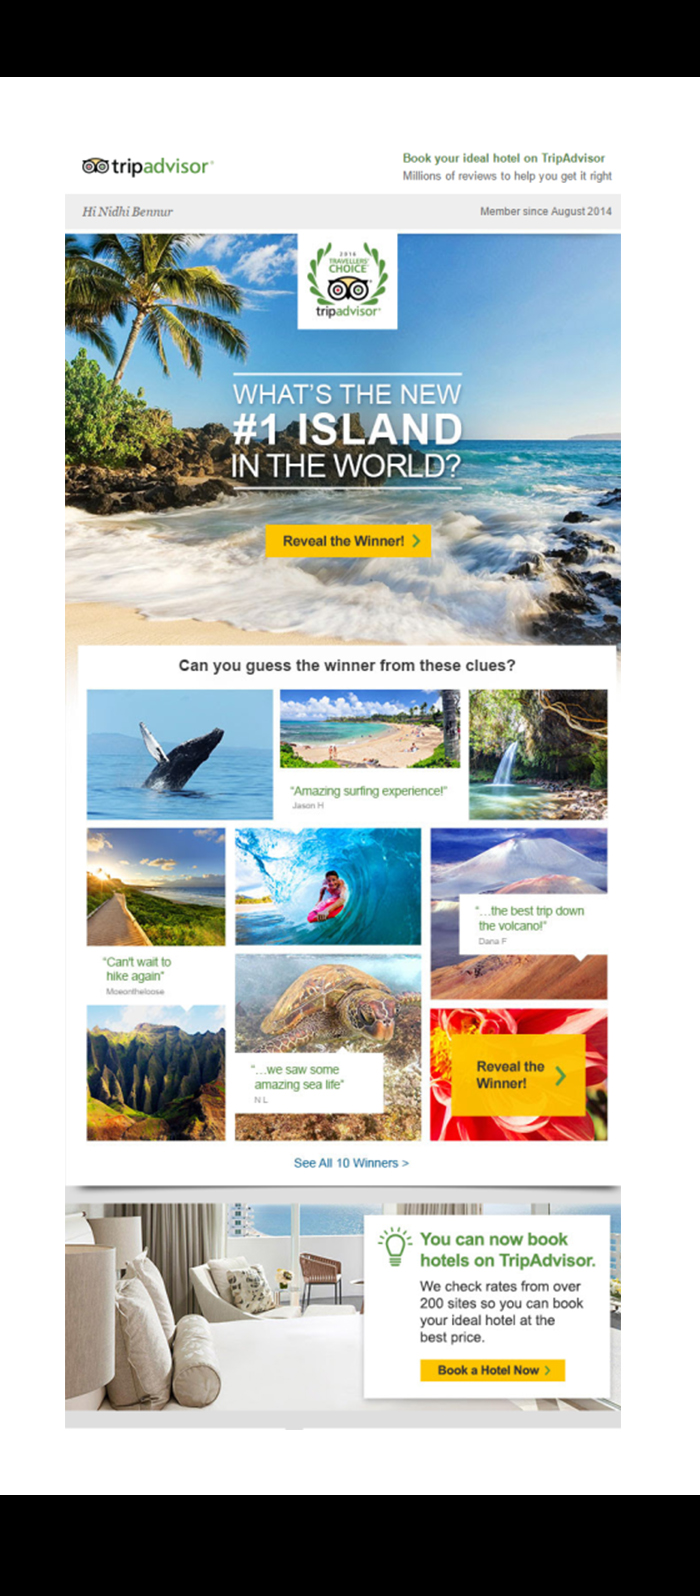 Email marketing strategies by TripAdvisor